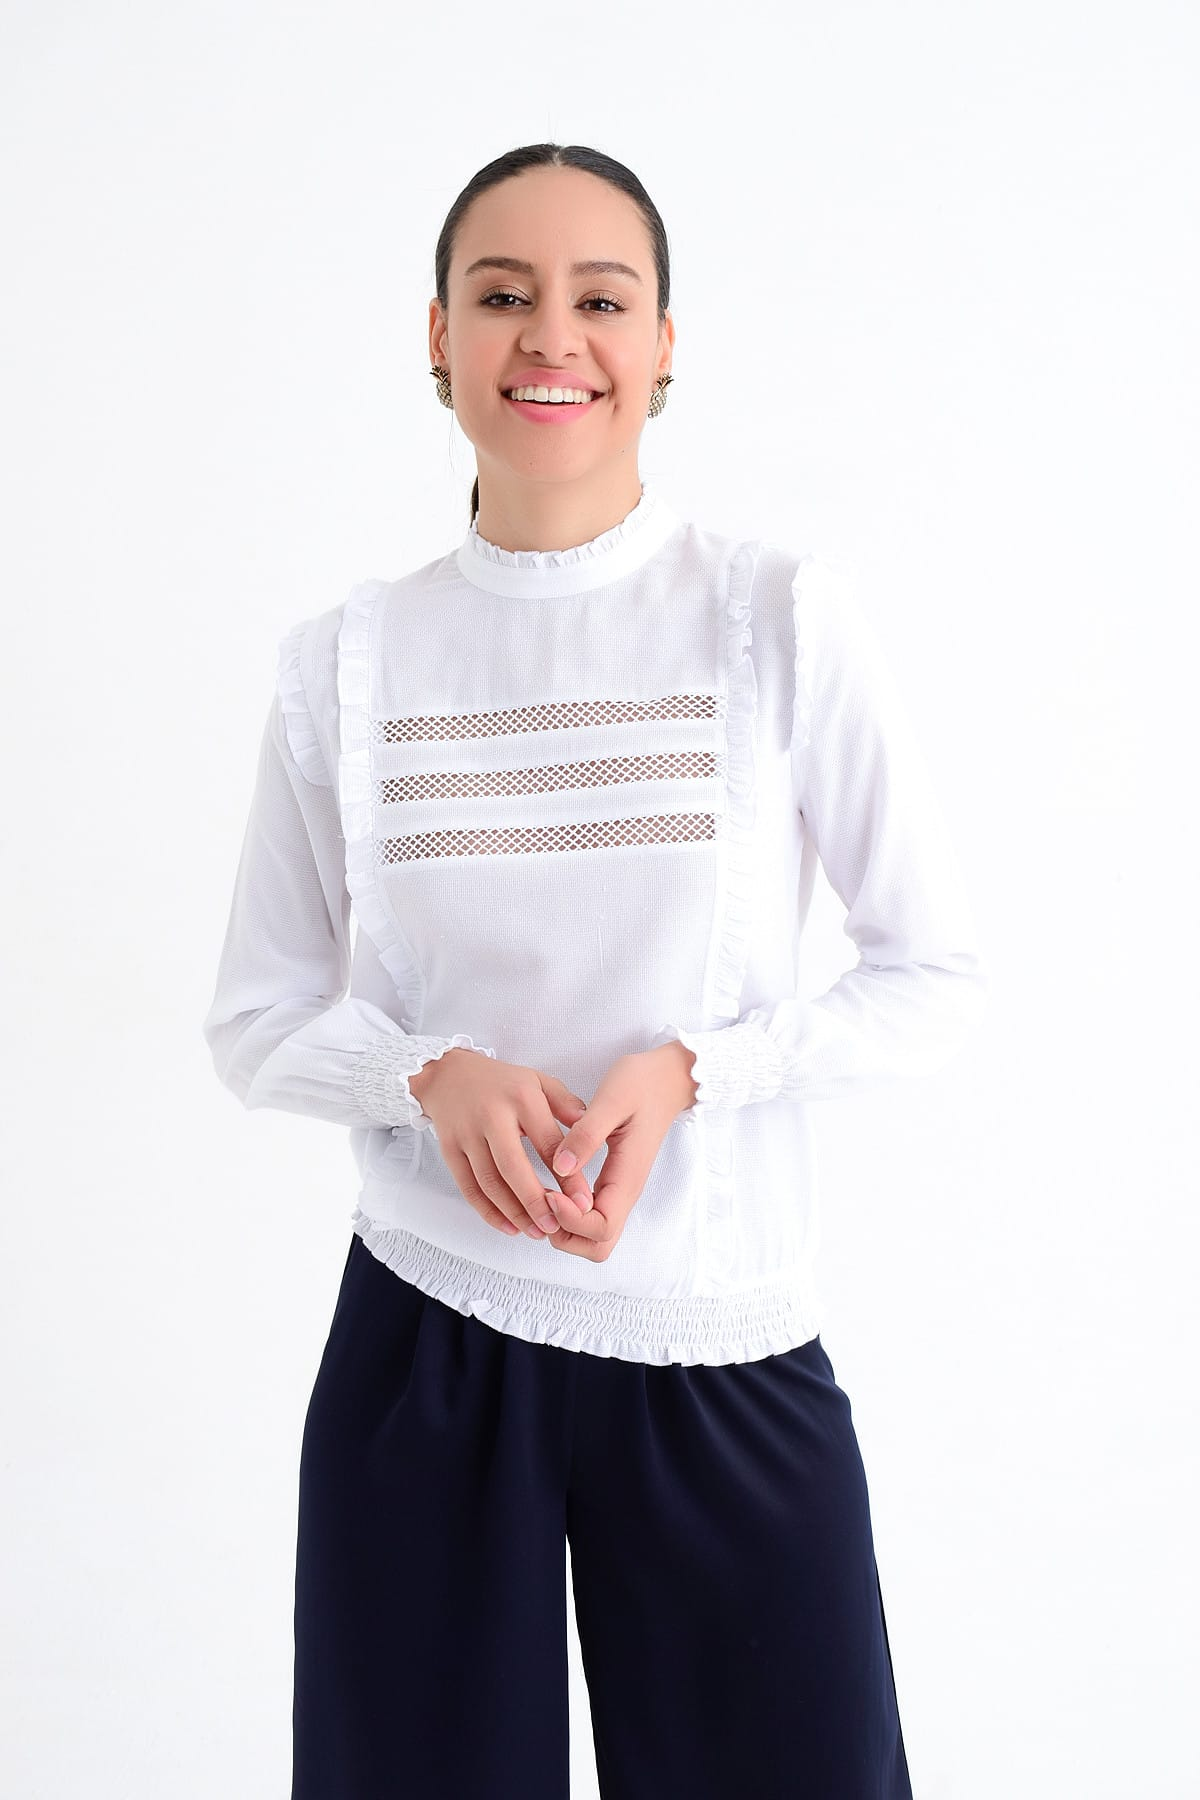 Hanna's by Hanna Darsa Kadın Beyaz Uzun Kollu Fırfır Ve Lastik Detaylı Detaylı Bluz HN1823 2